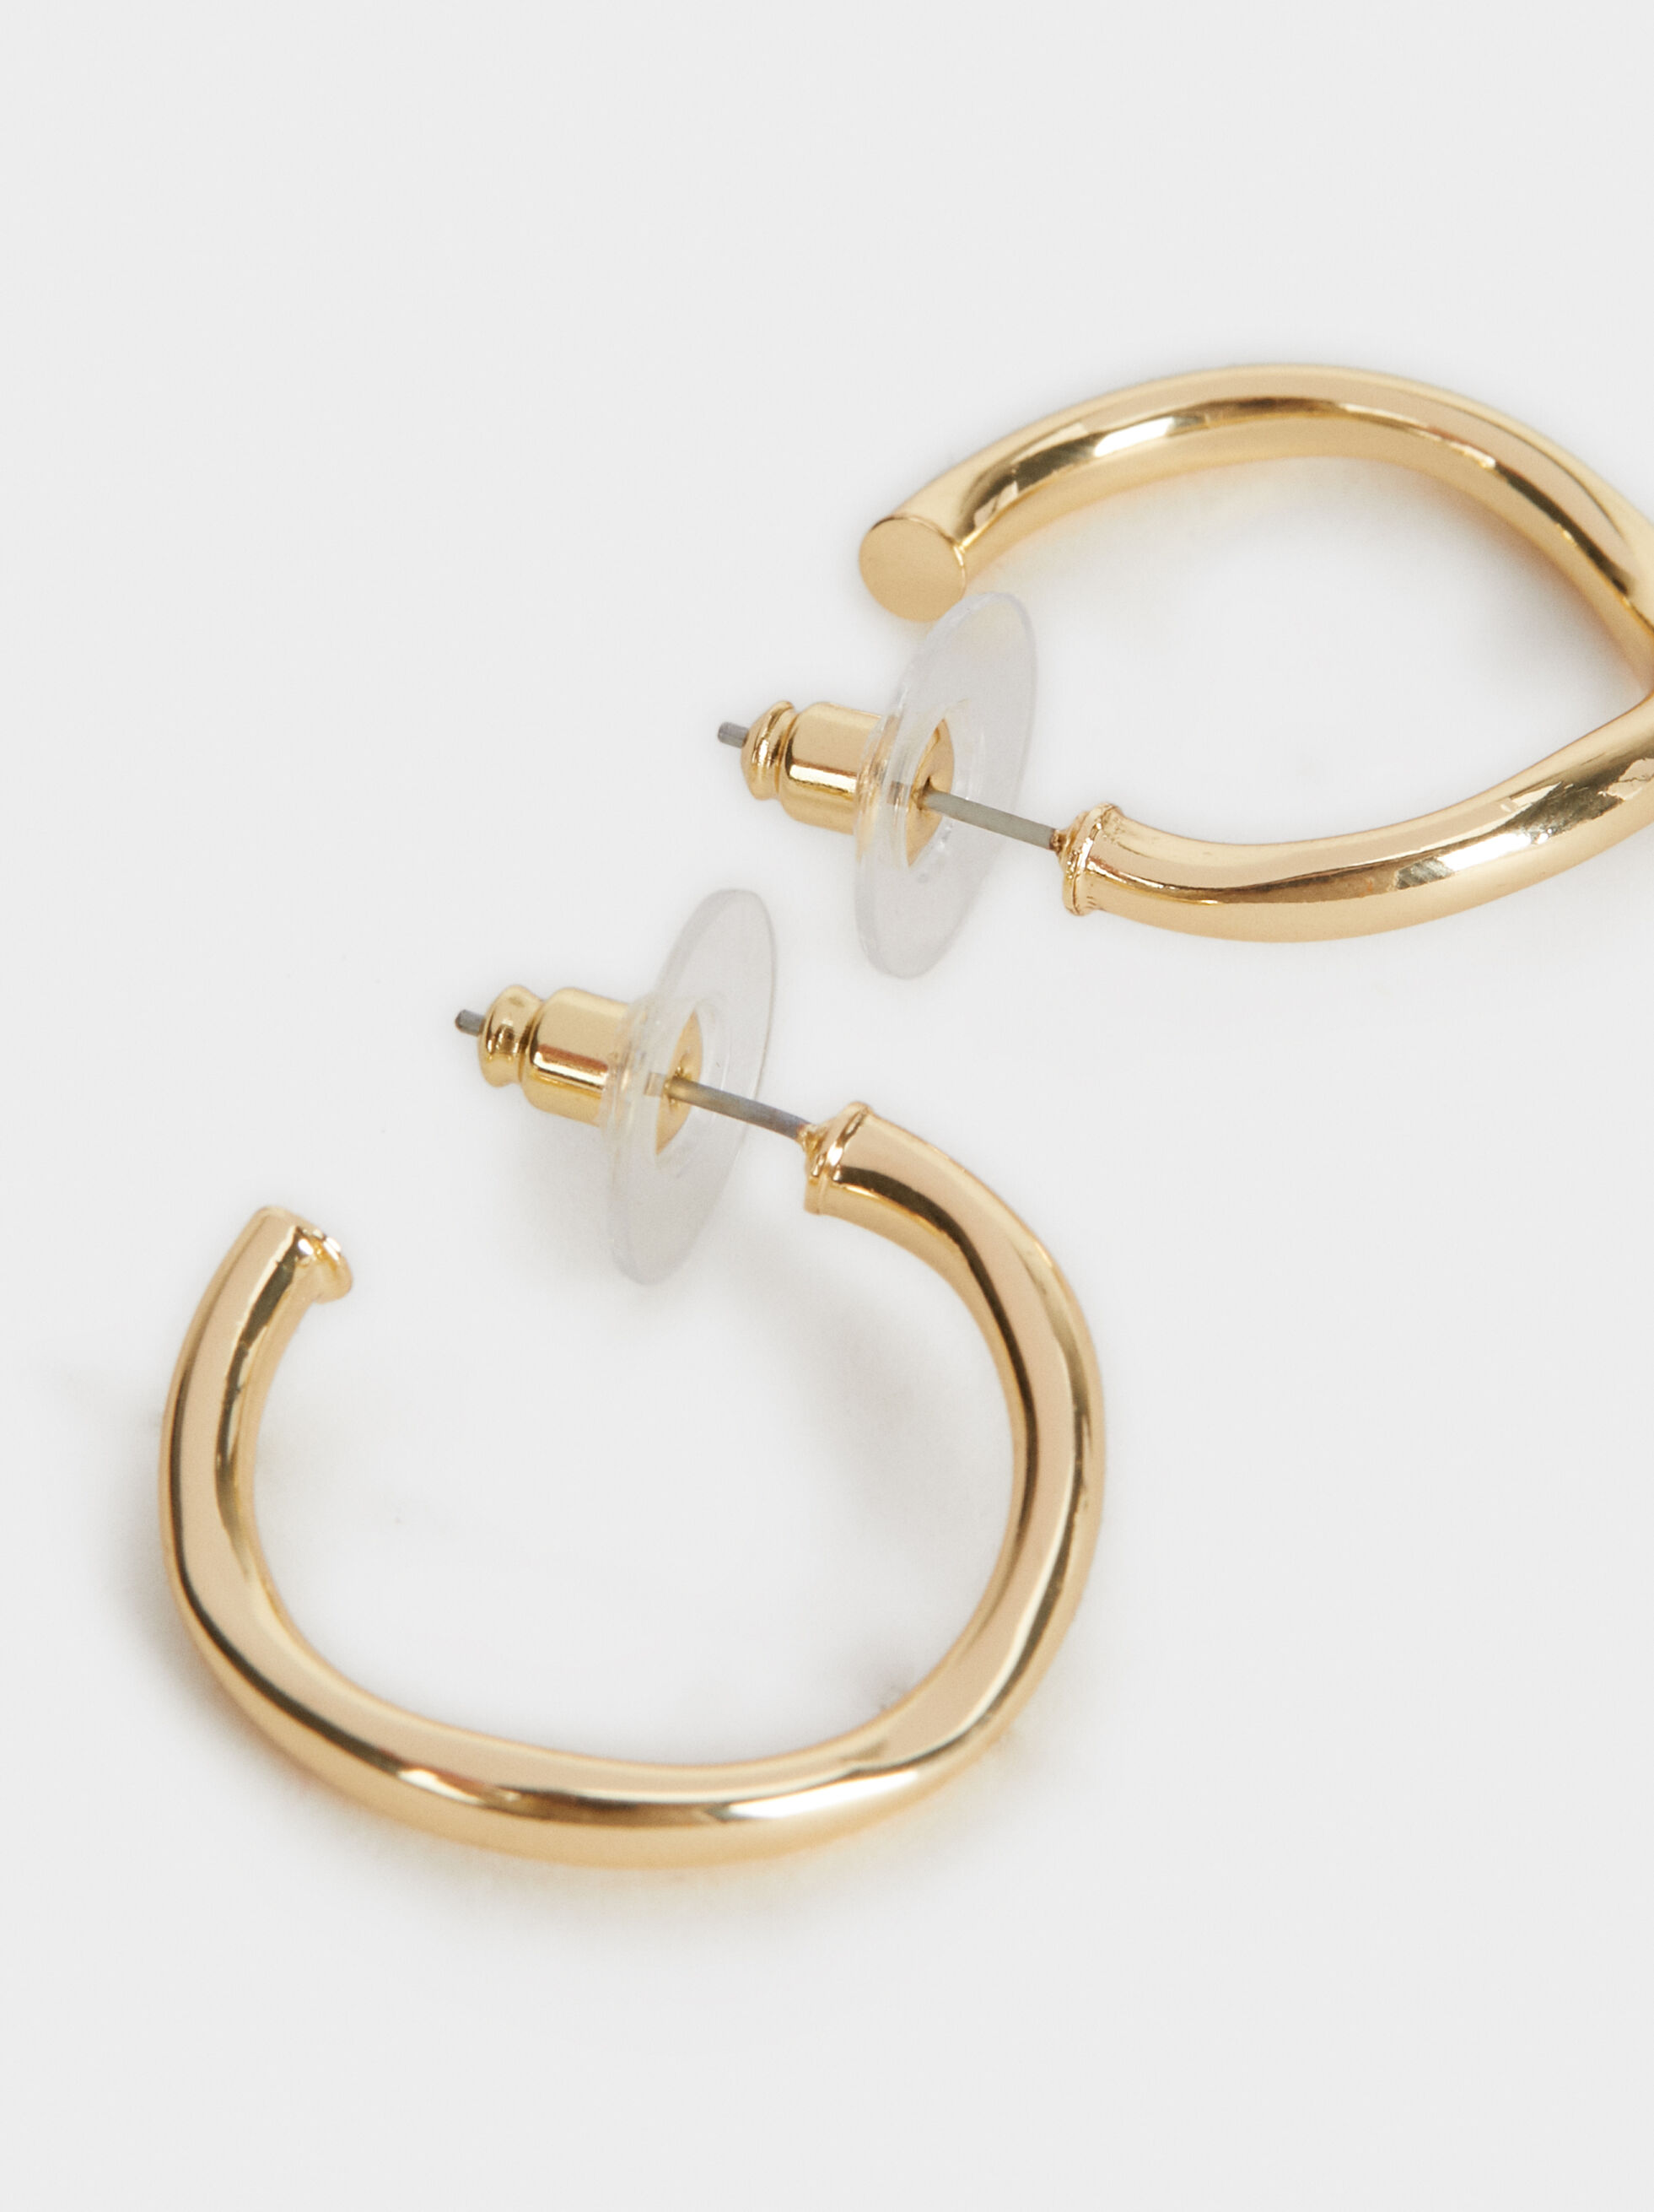 Small Golden Basics Hoop Earrings, Golden, hi-res